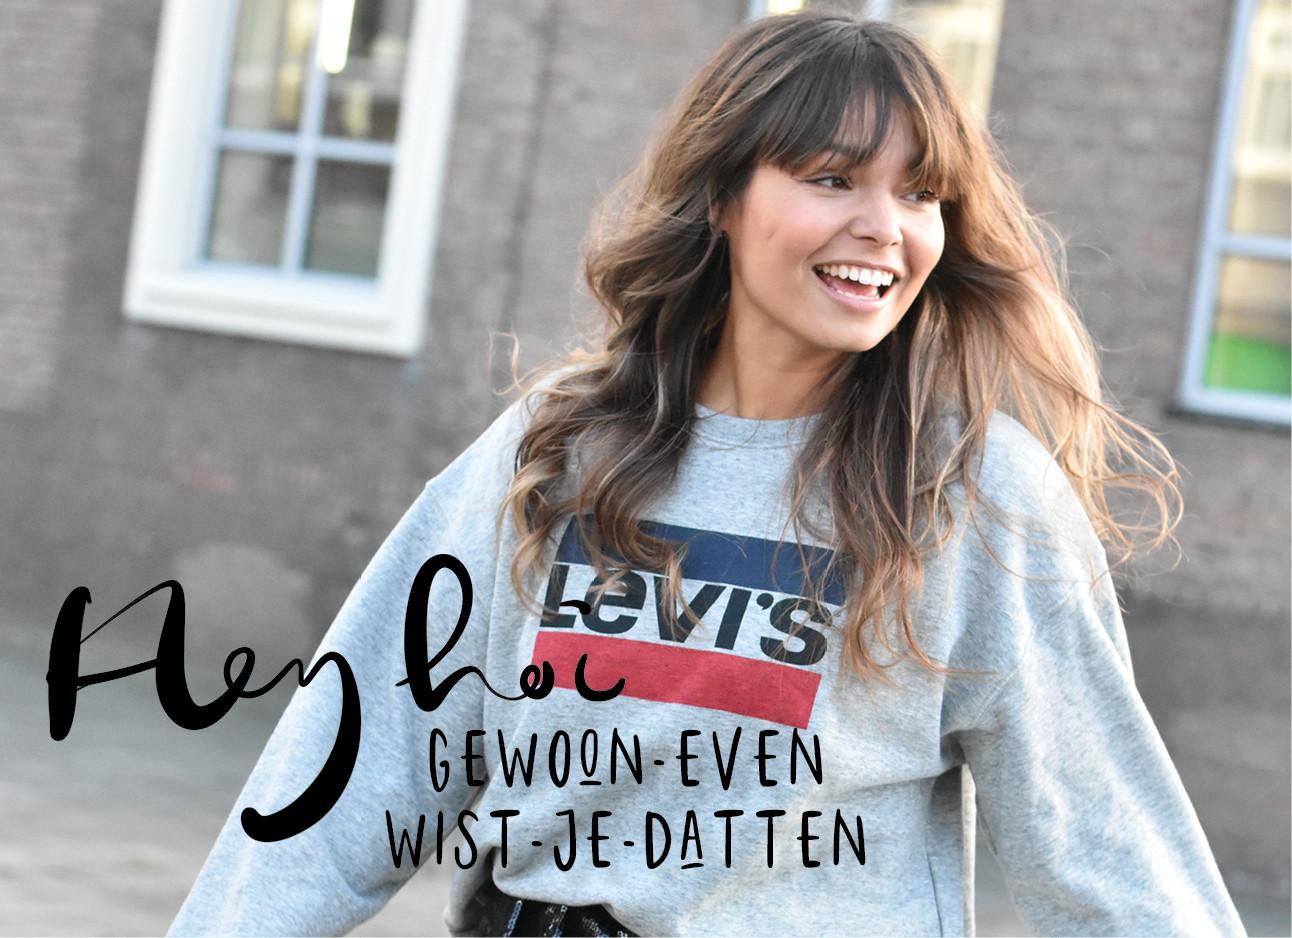 Kiki die lachend op straat lopopt en levi's trui draagt